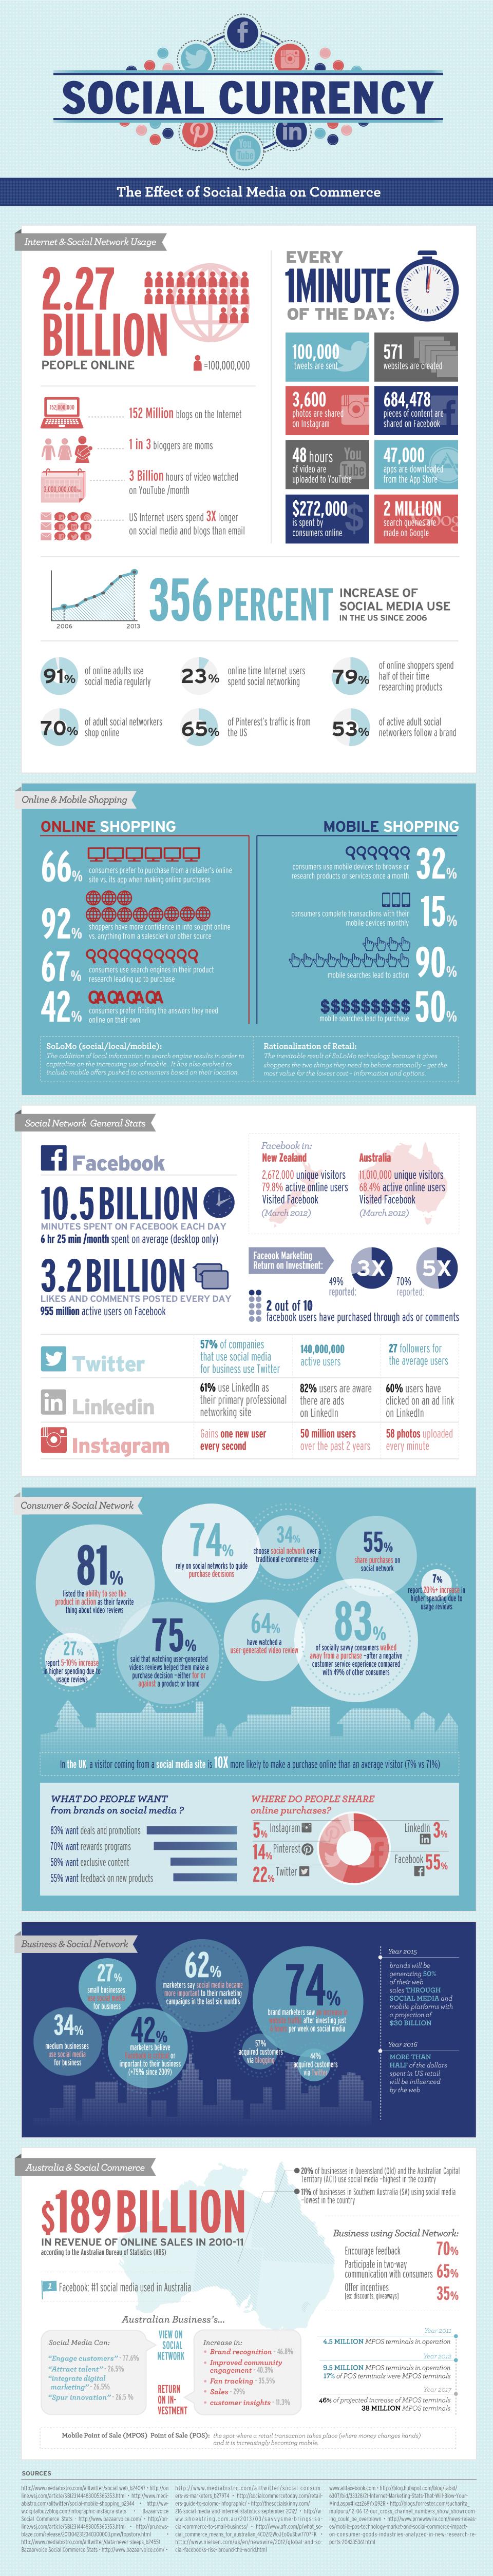 social media e acquisti online